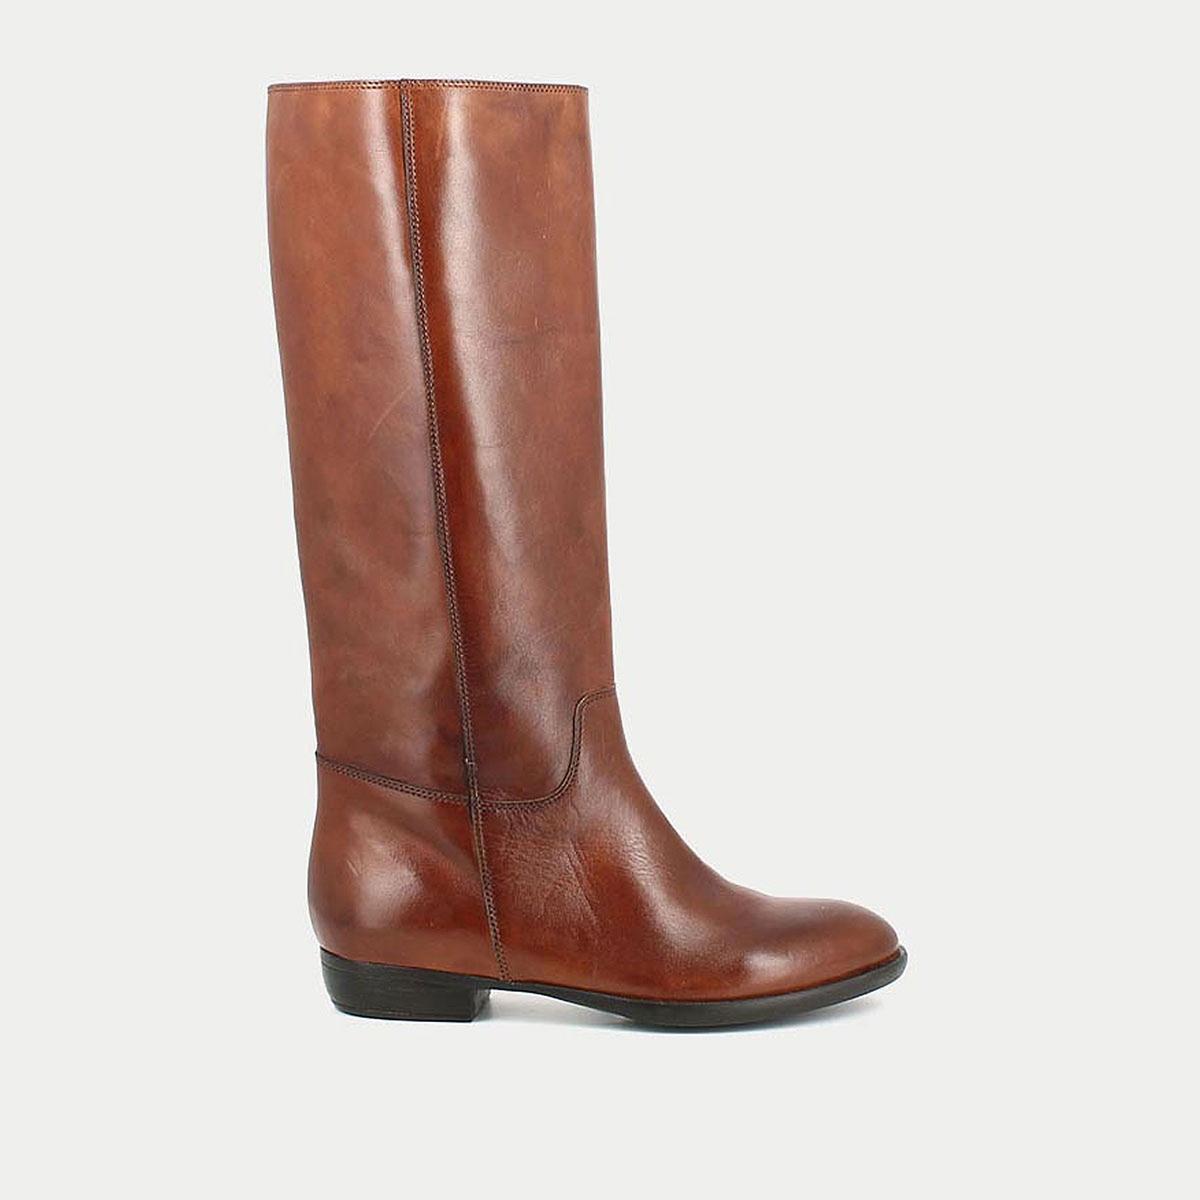 Сапоги кожаные на плоском каблуке 1137 цены онлайн